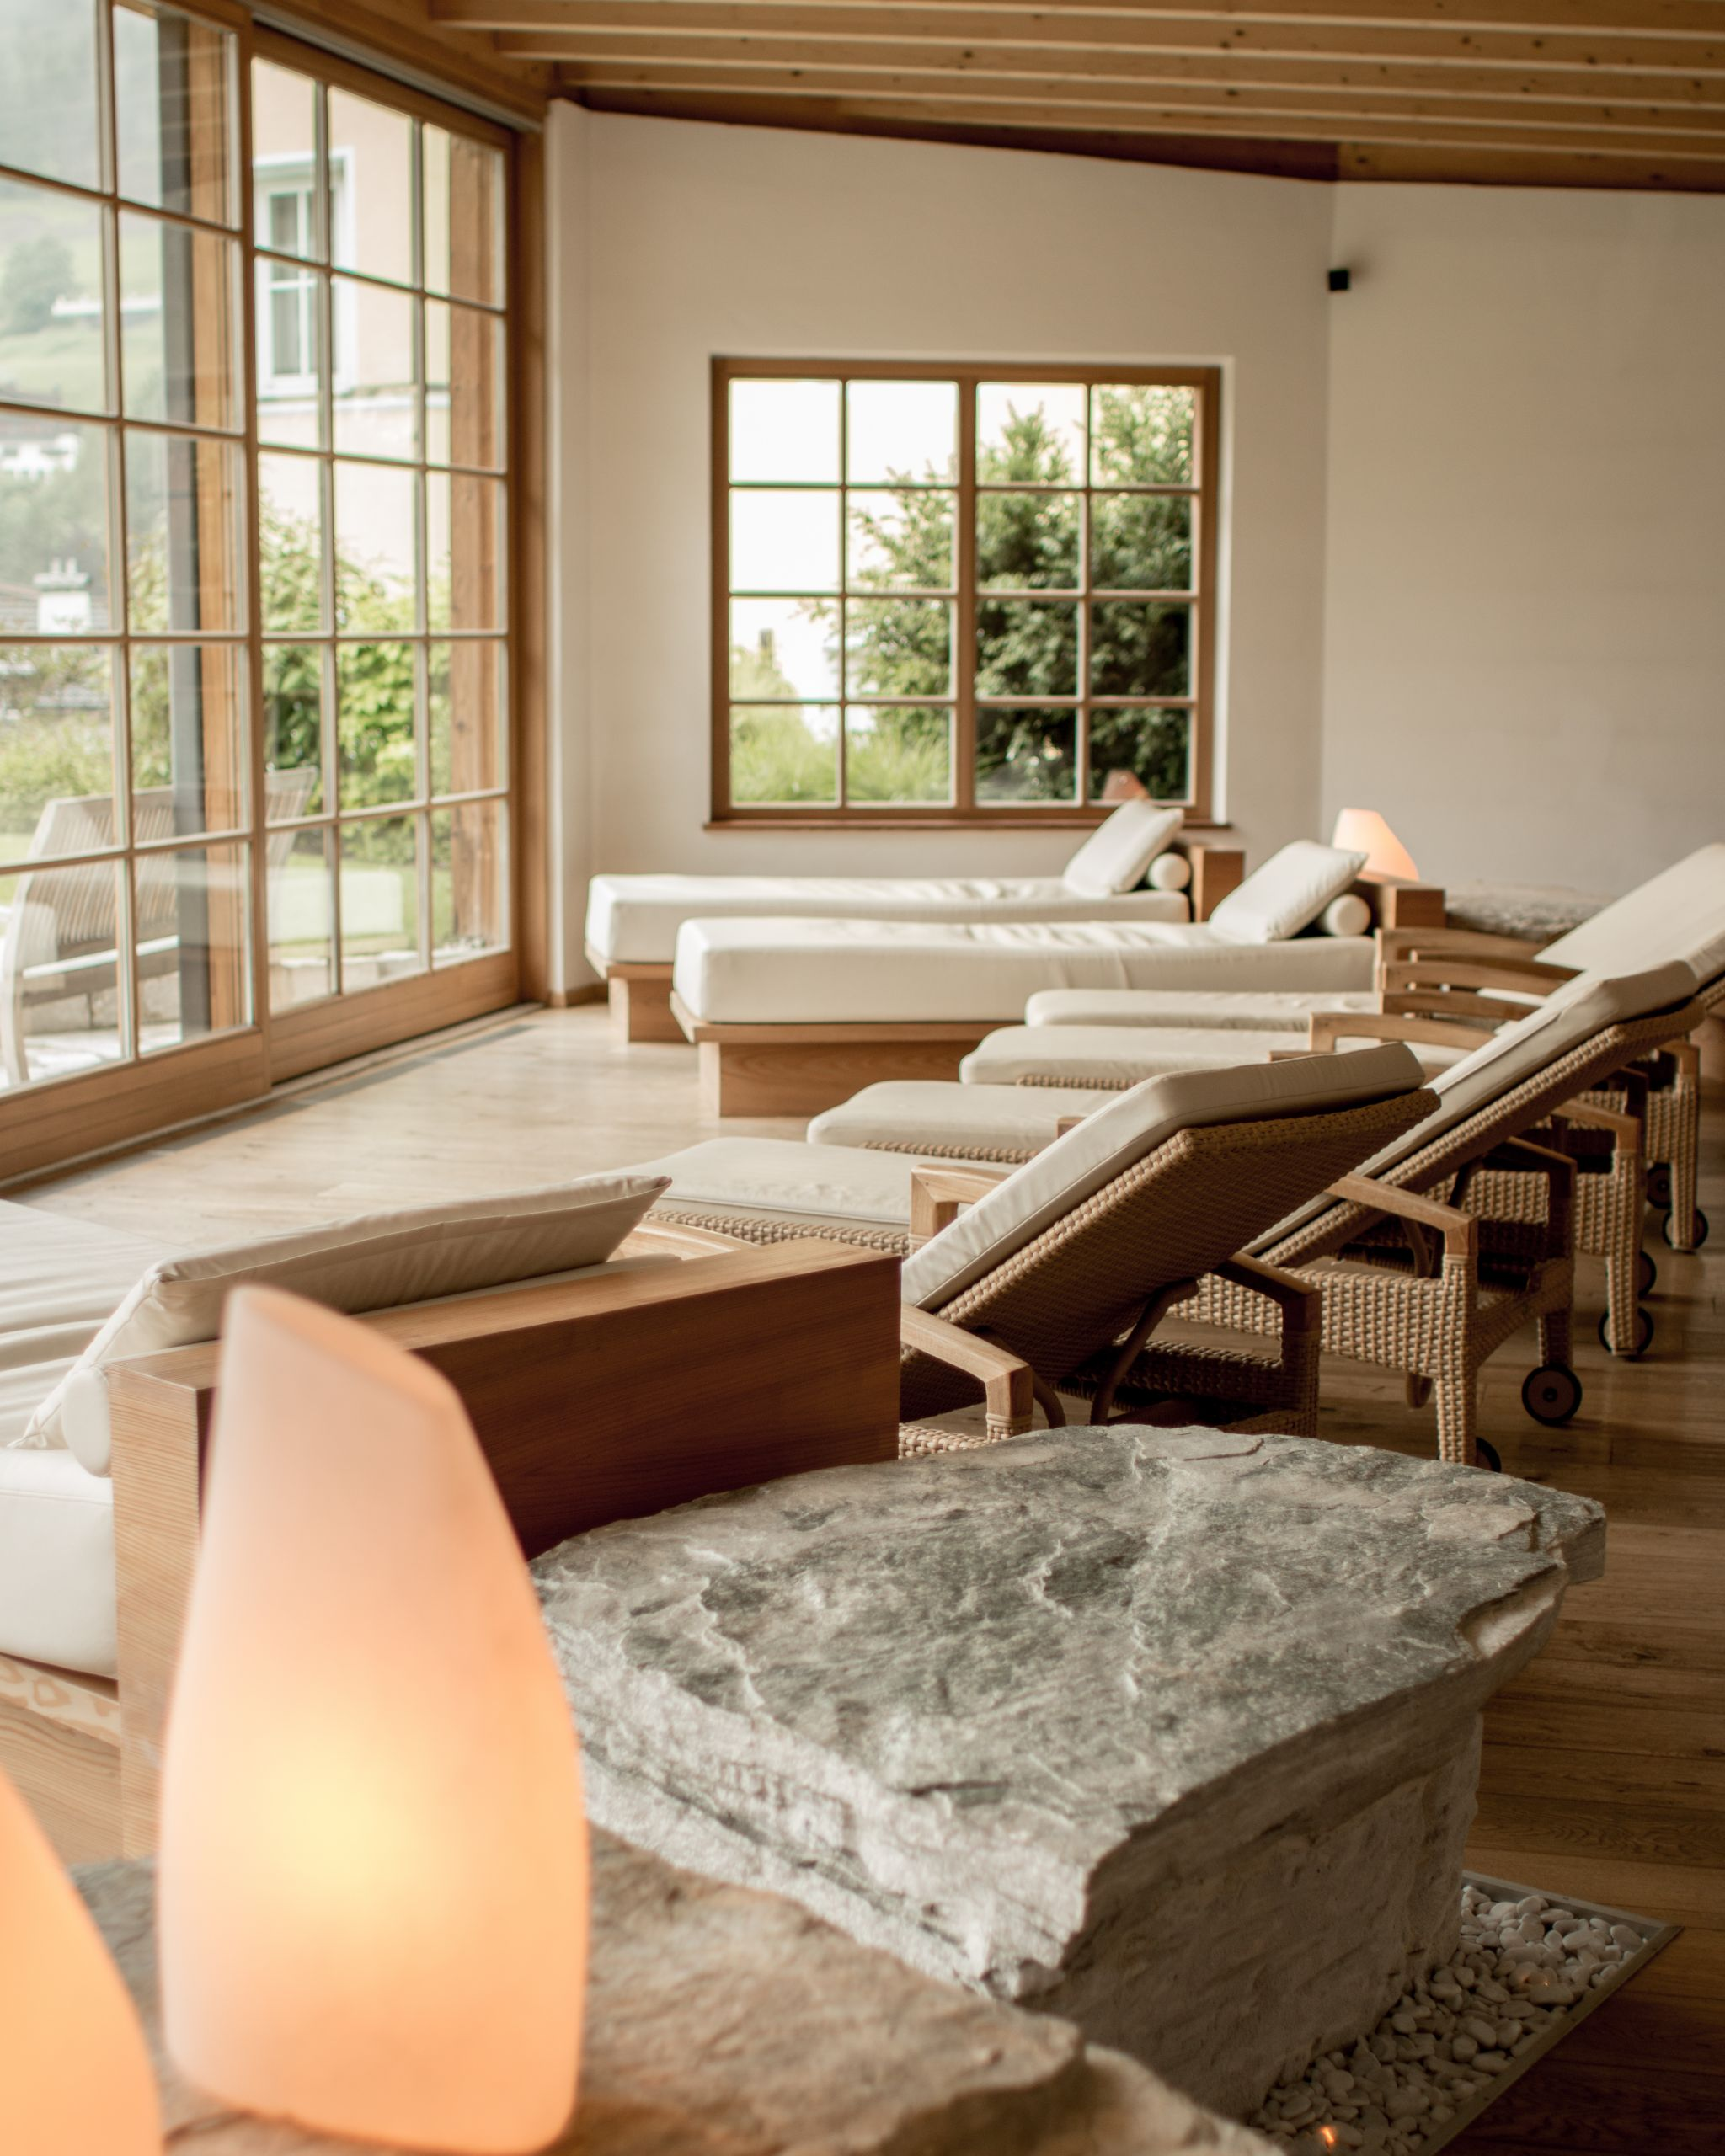 Adler Dolomites Hotel Ortisei Italy Hotel Review Sauna